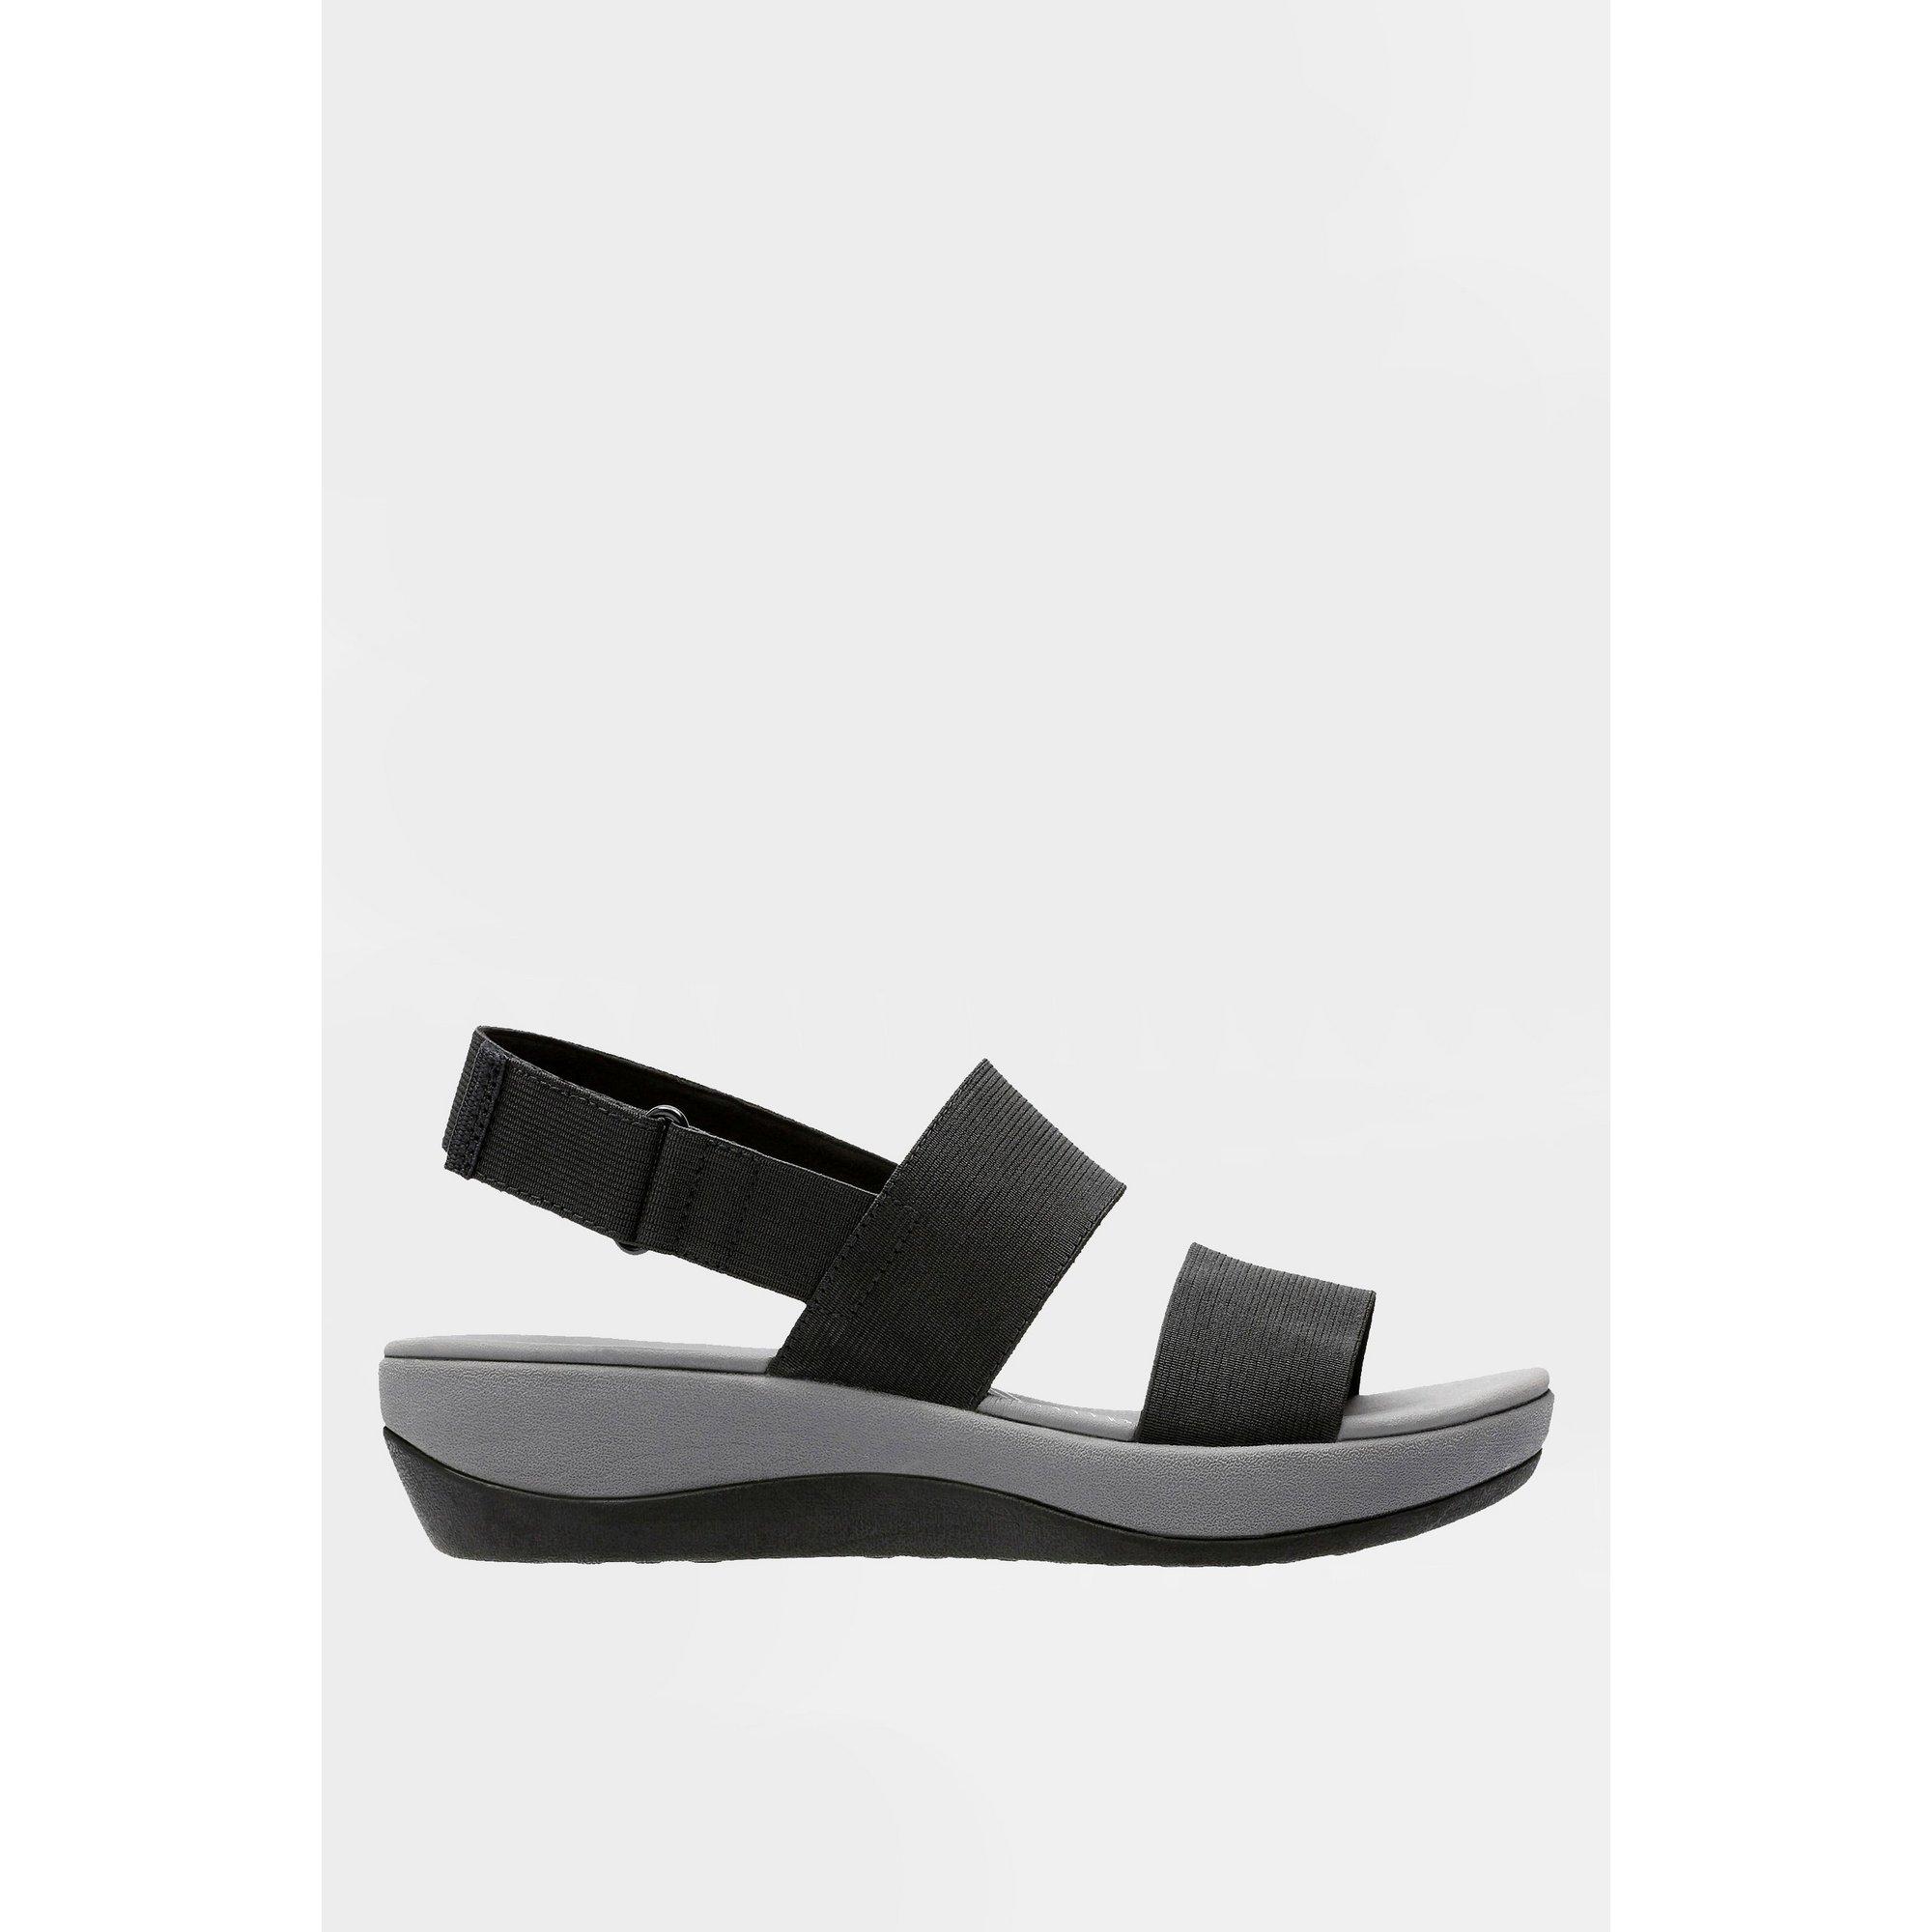 Image of Clarks Arla Jacory Black Sandals